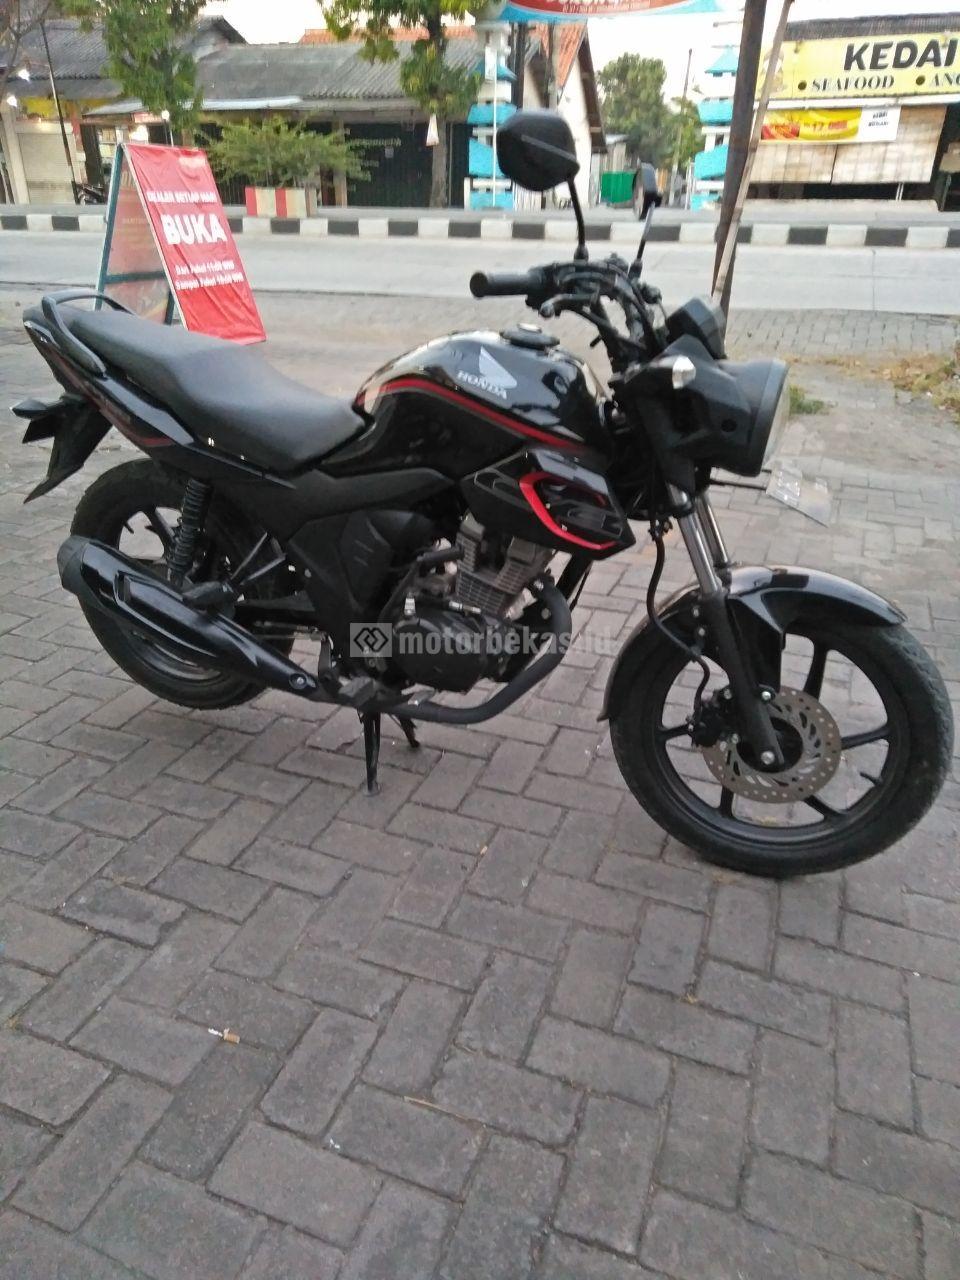 HONDA CB VERSA 150  3003 motorbekas.id